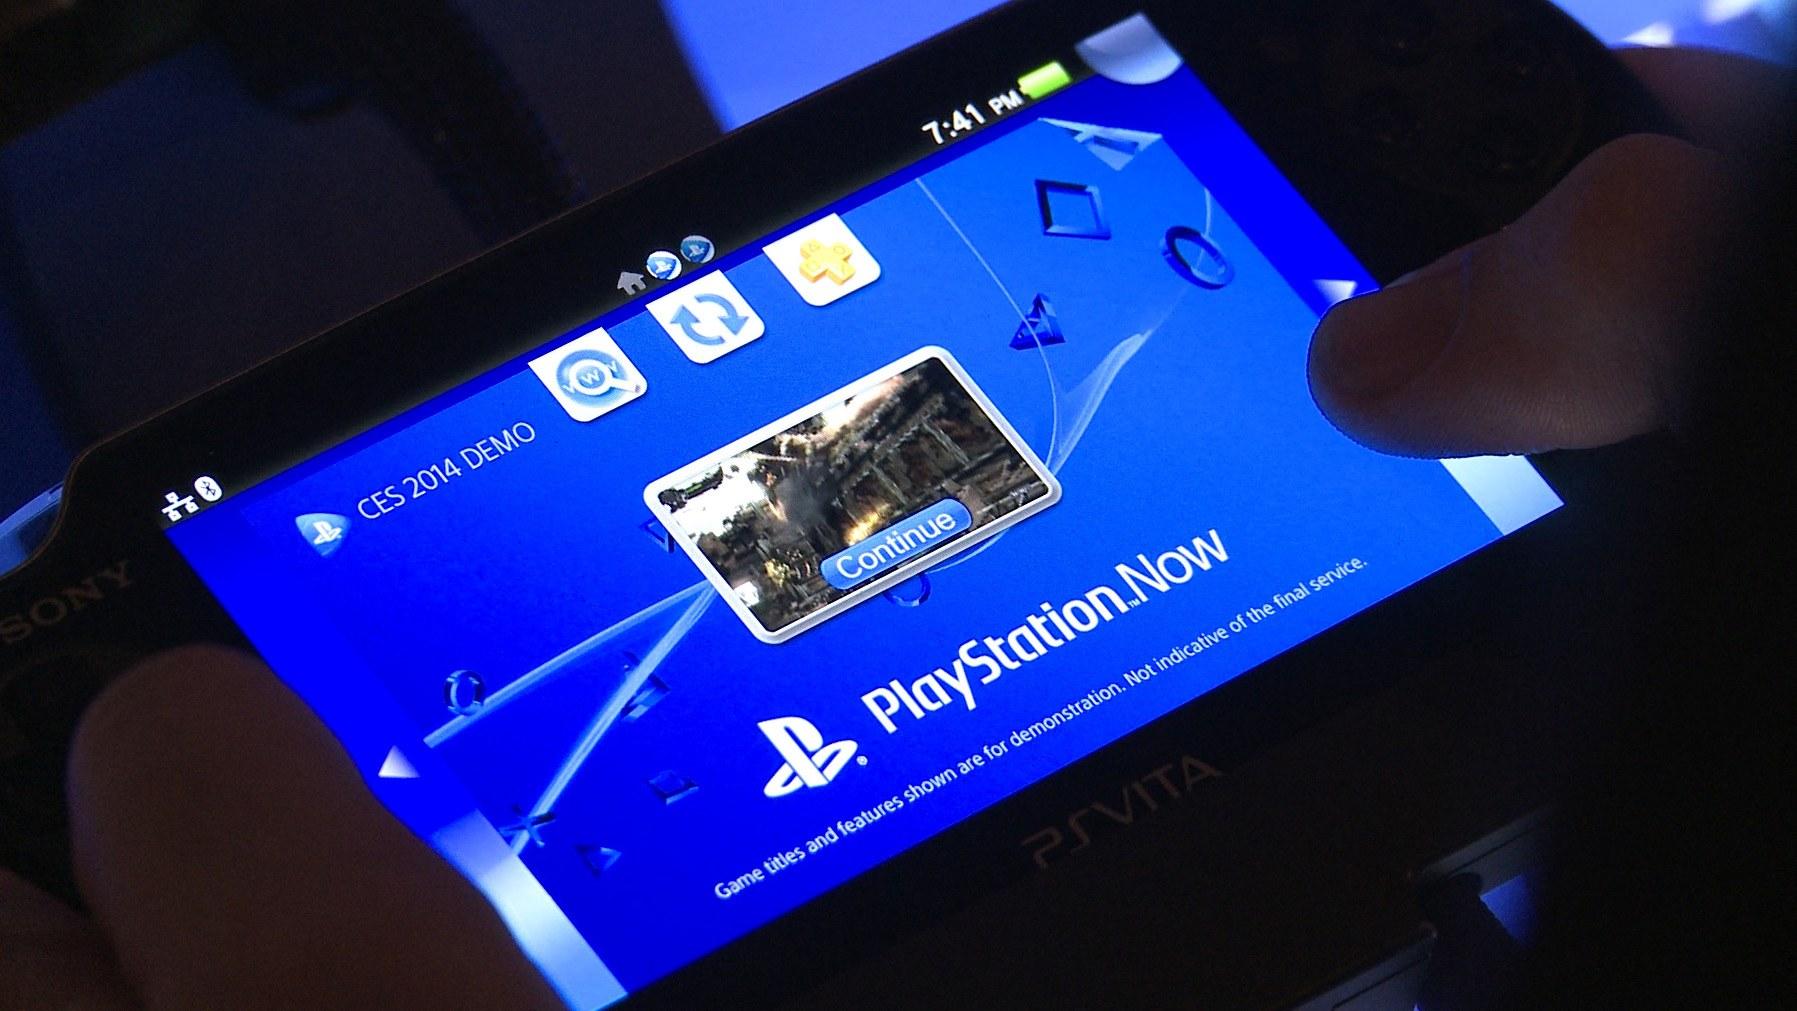 Playstation-Now-ps-vita